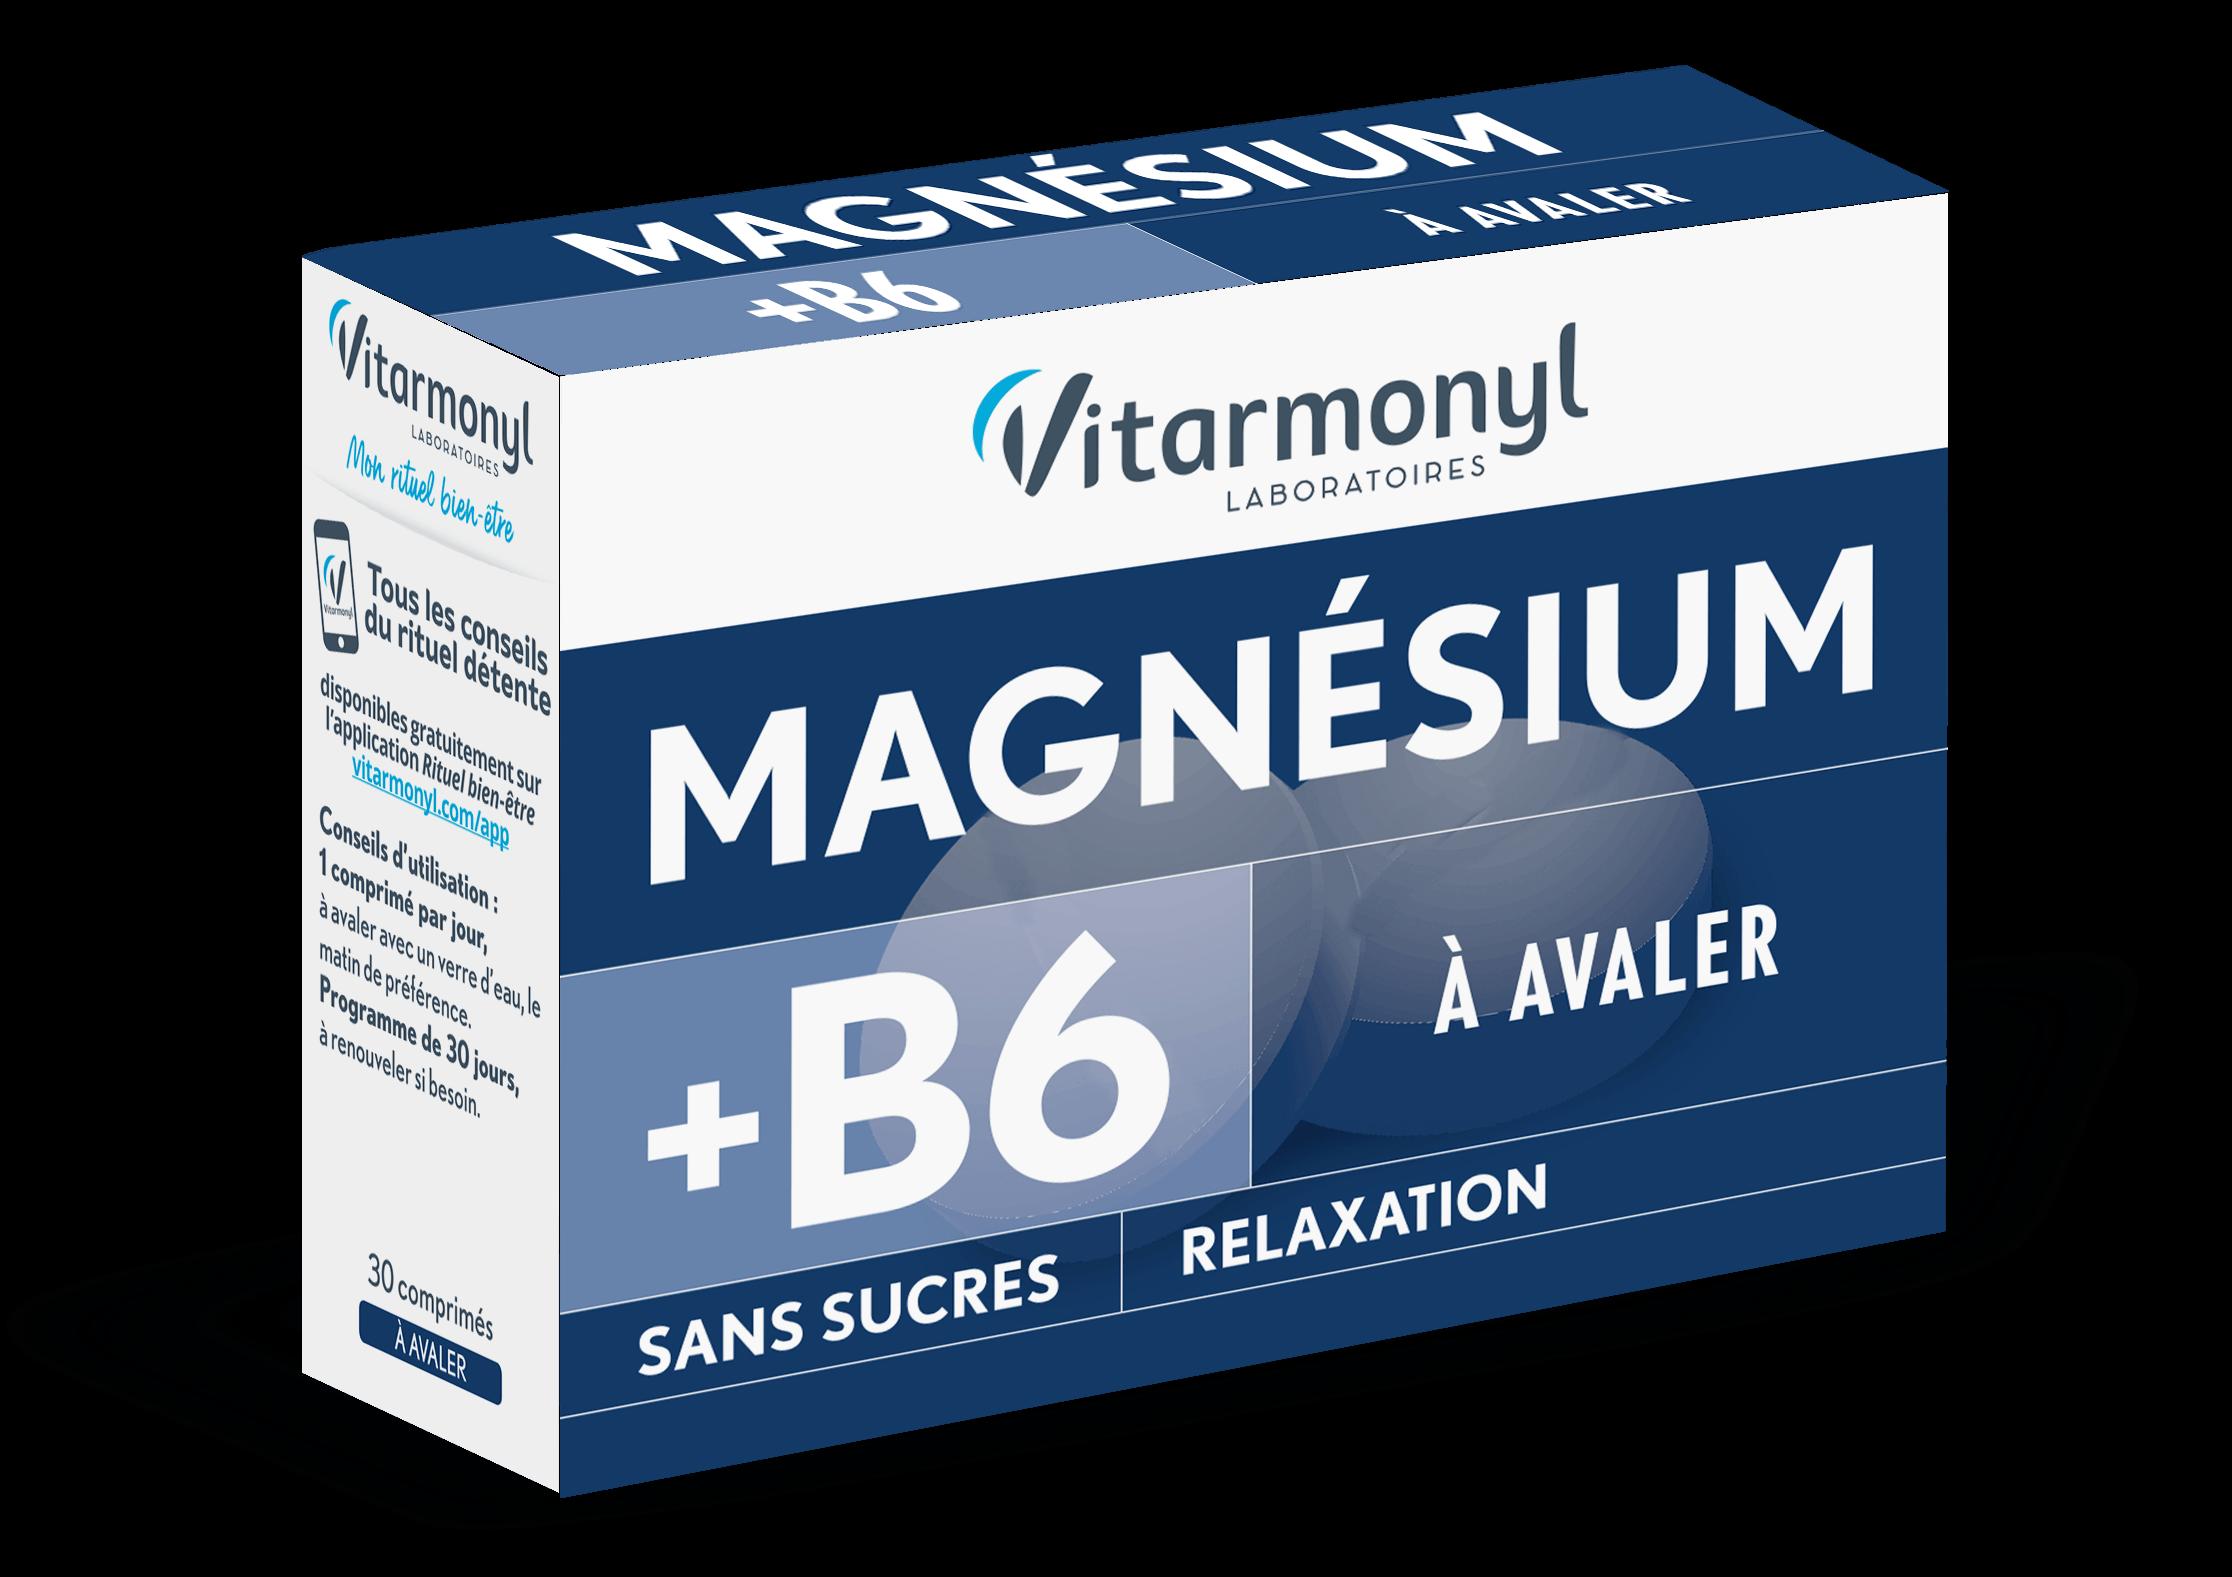 Image Magnésium + B6 – A avaler